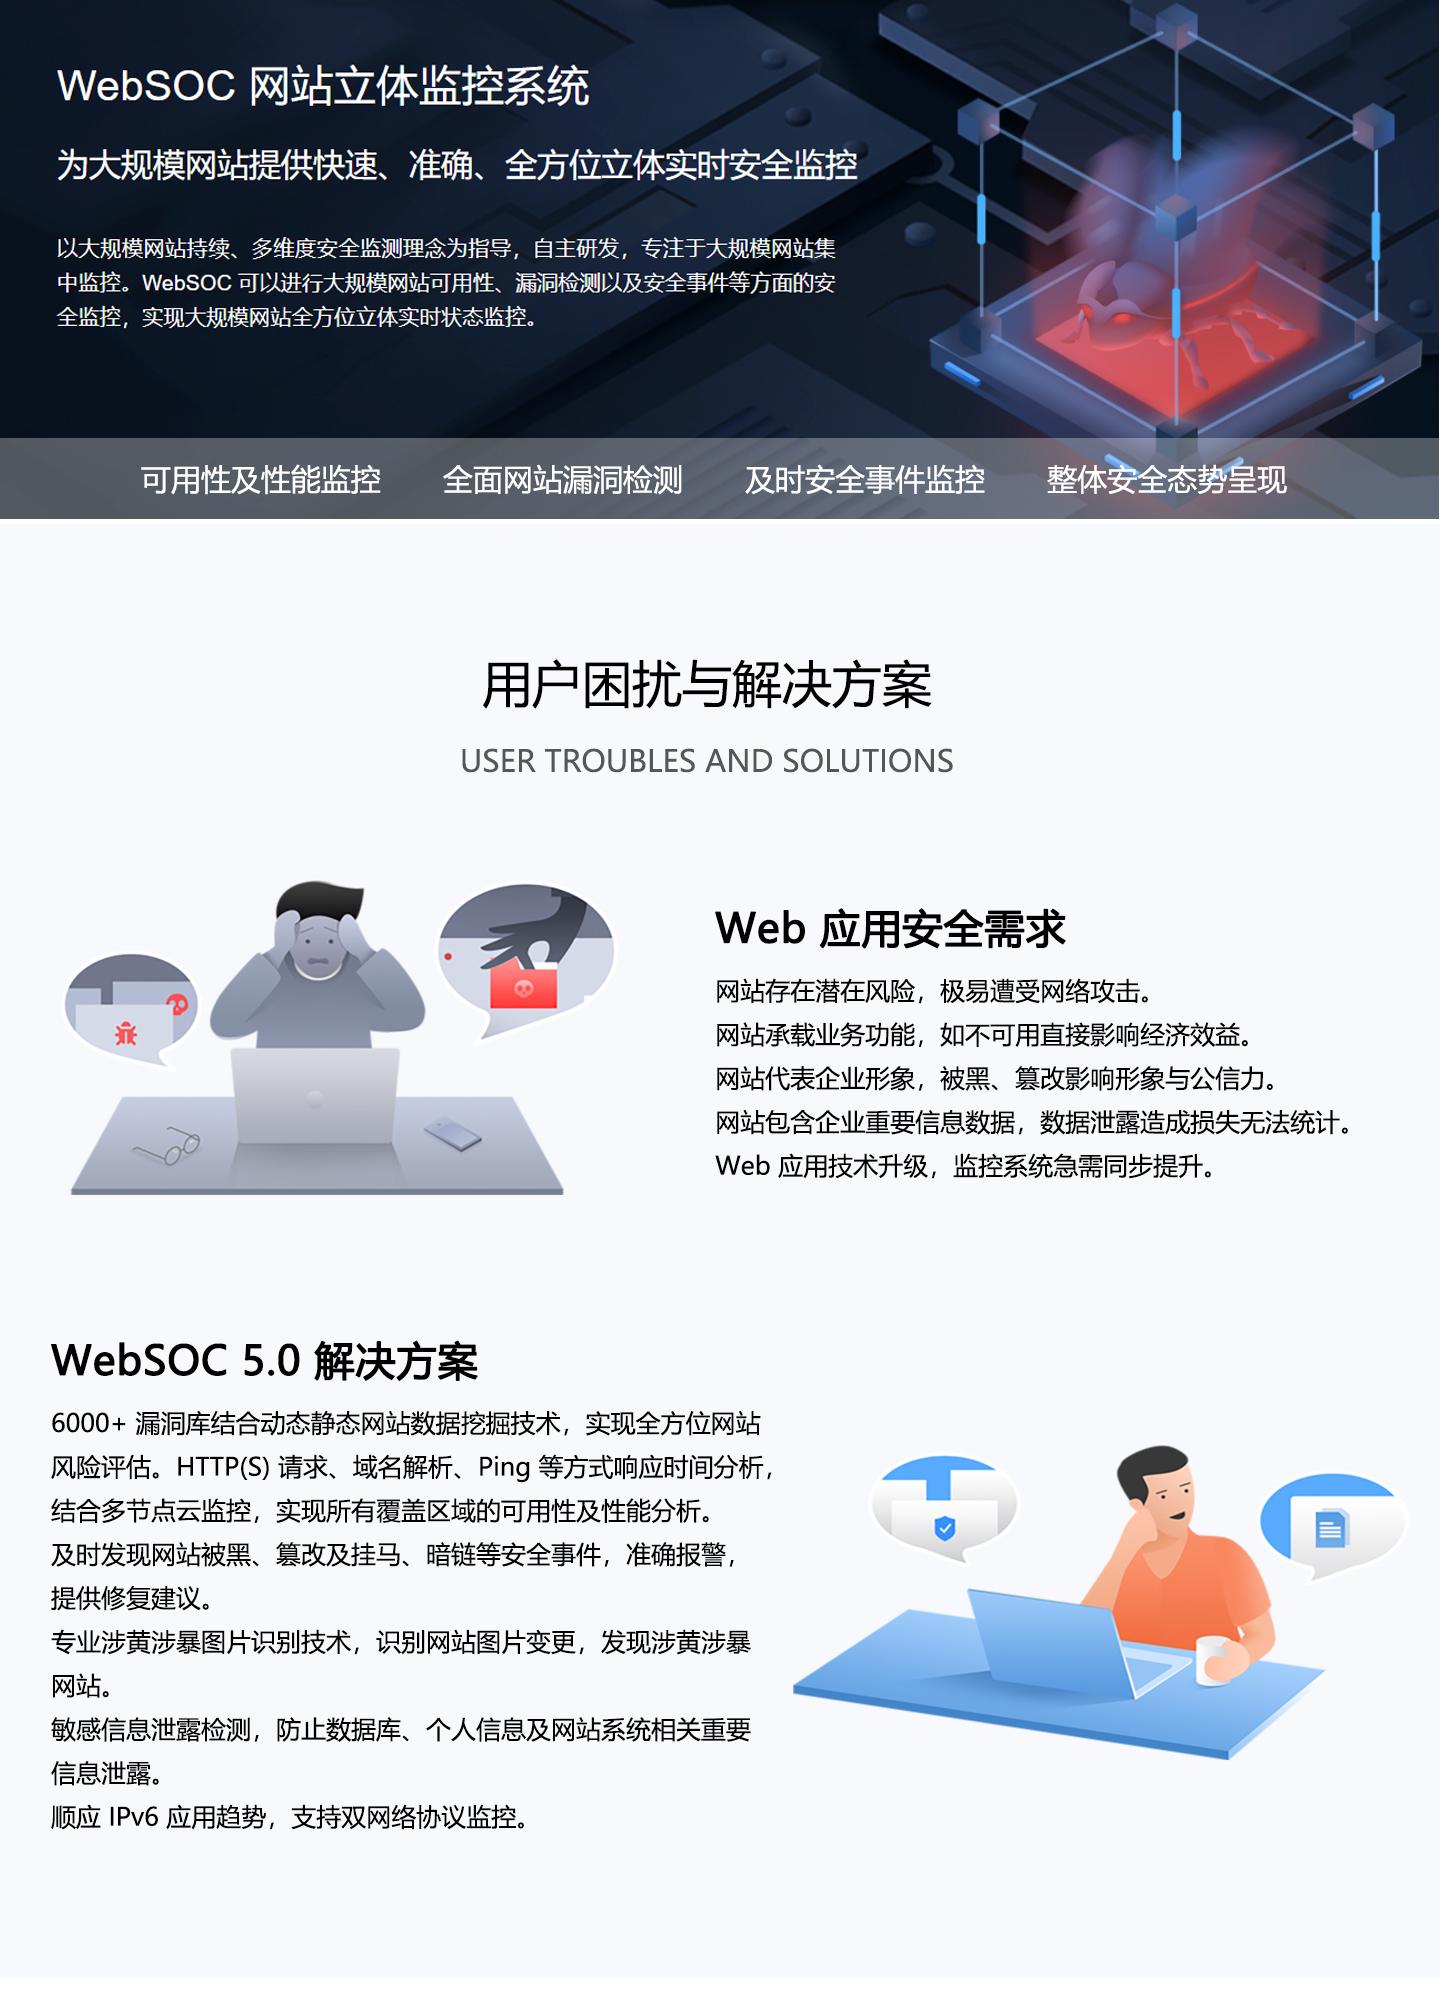 WebSOC-网站立体监控系统1440_01.jpg